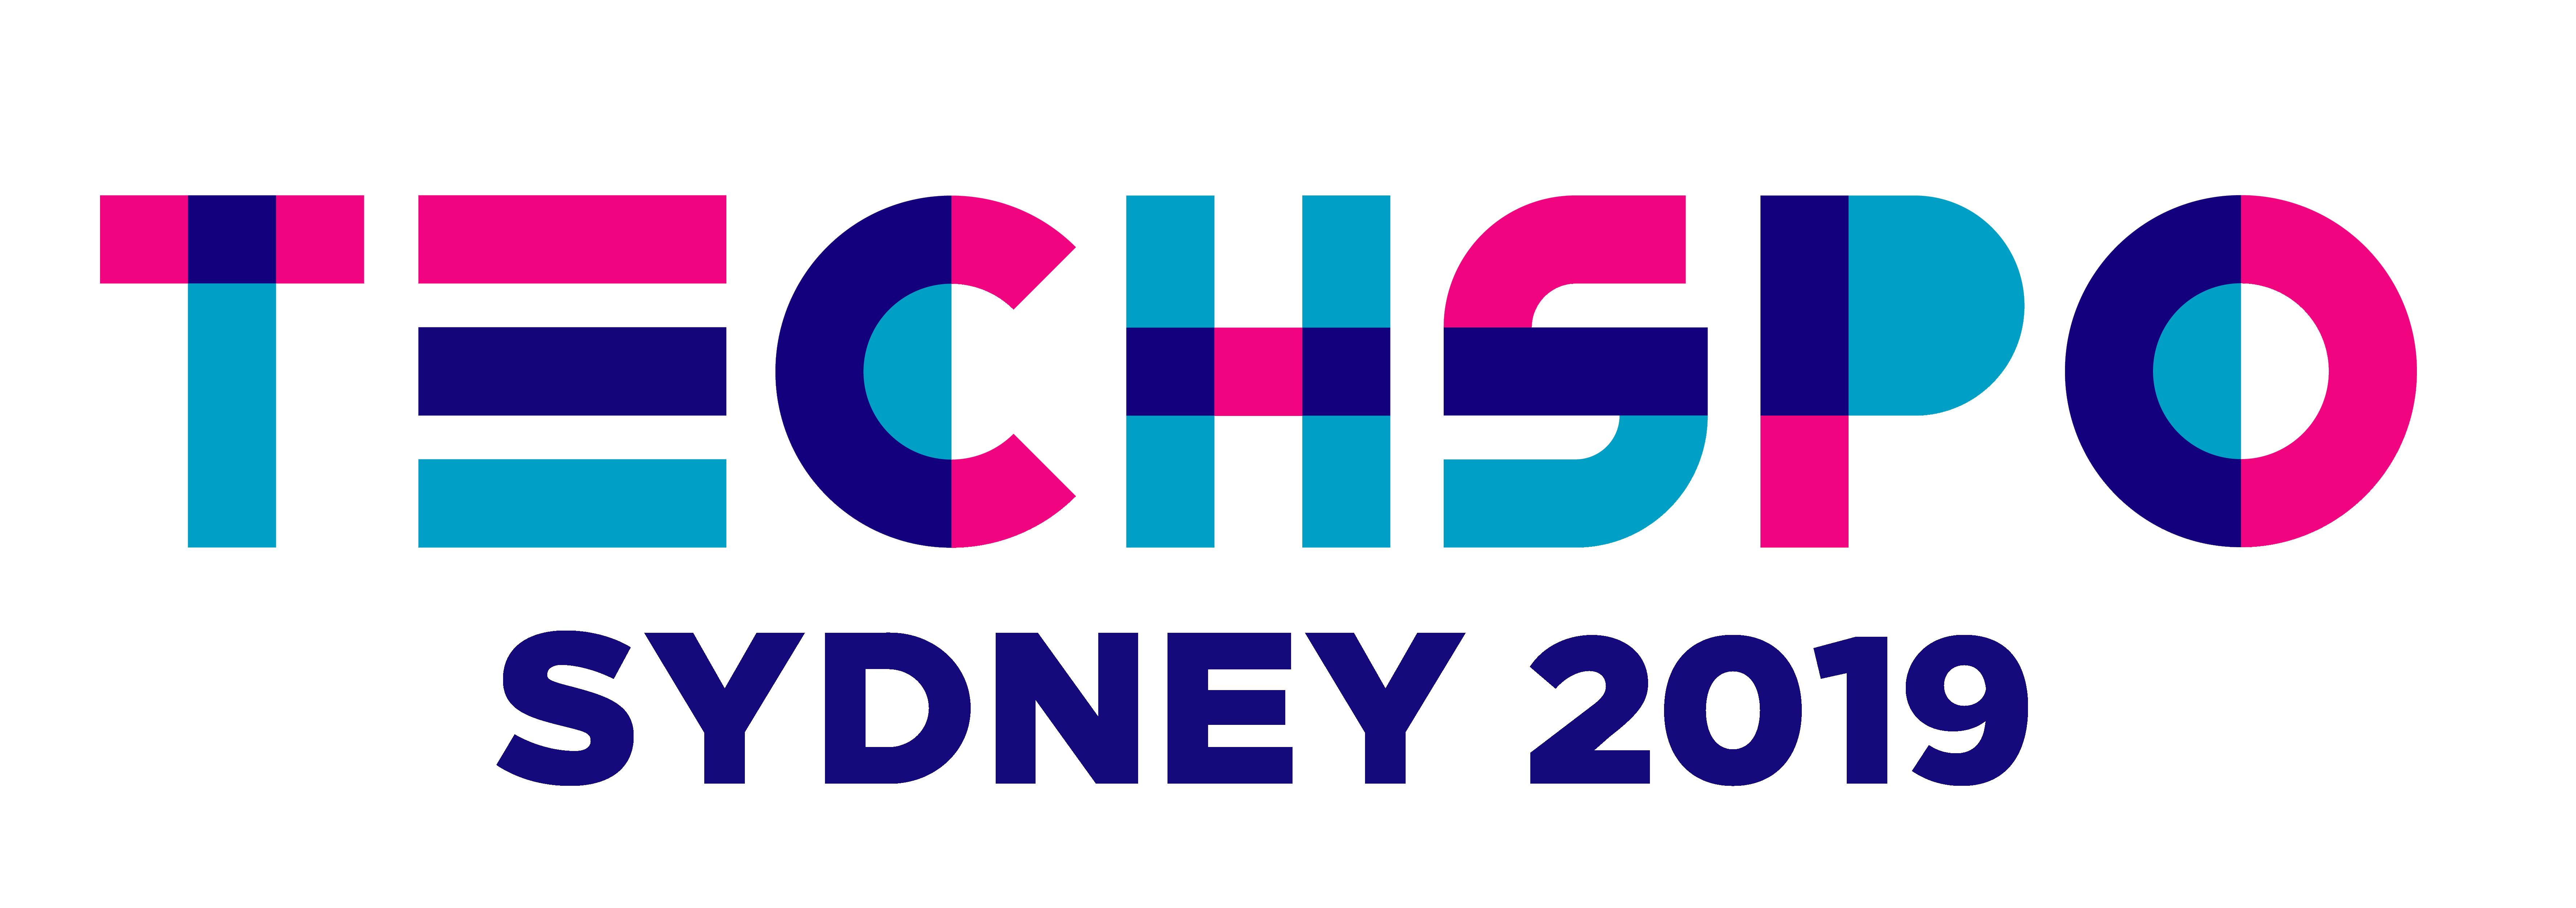 TECHSPO Sydney 2019